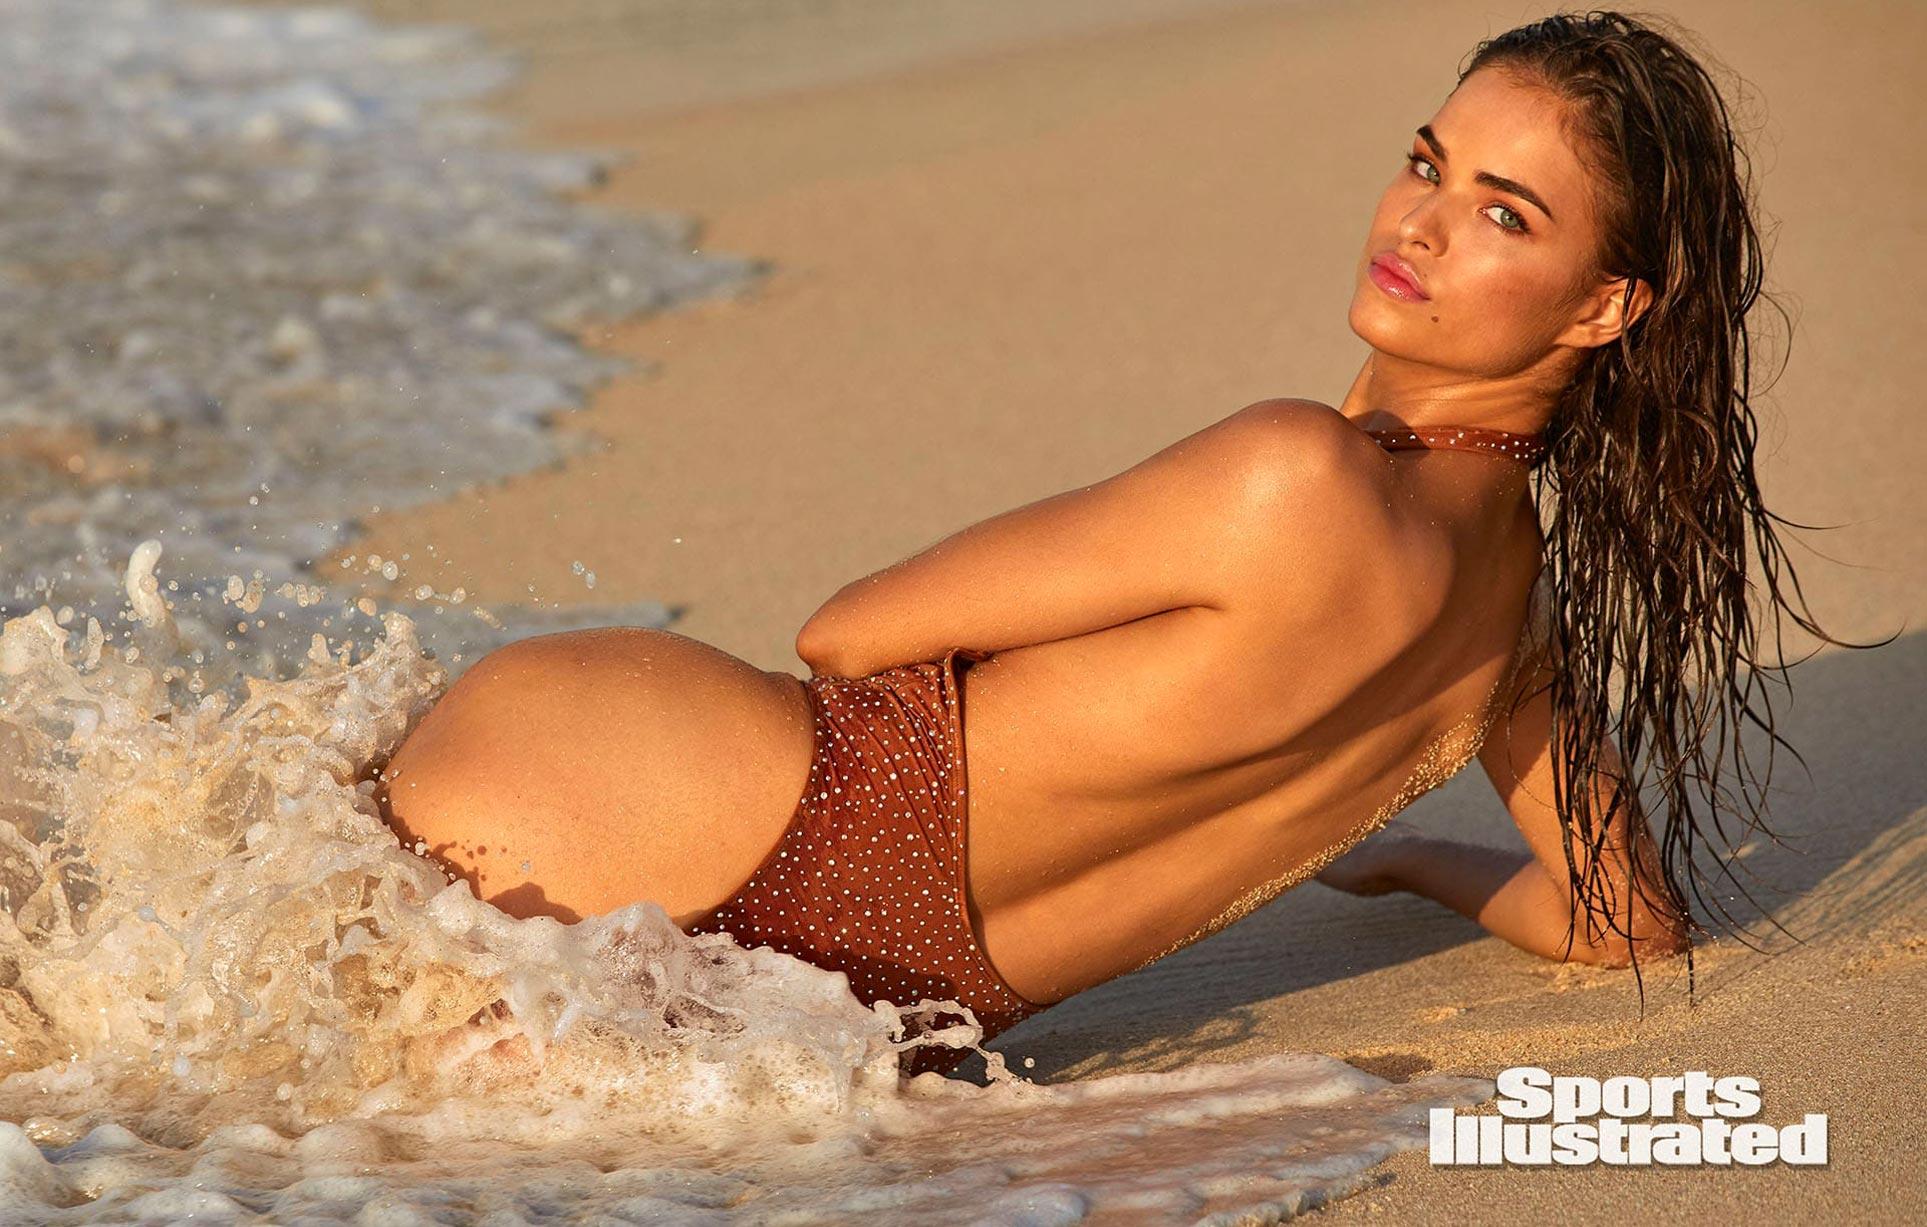 Робин Хольцкен в каталоге купальников Sports Illustrated Swimsuit 2020 / фото 27